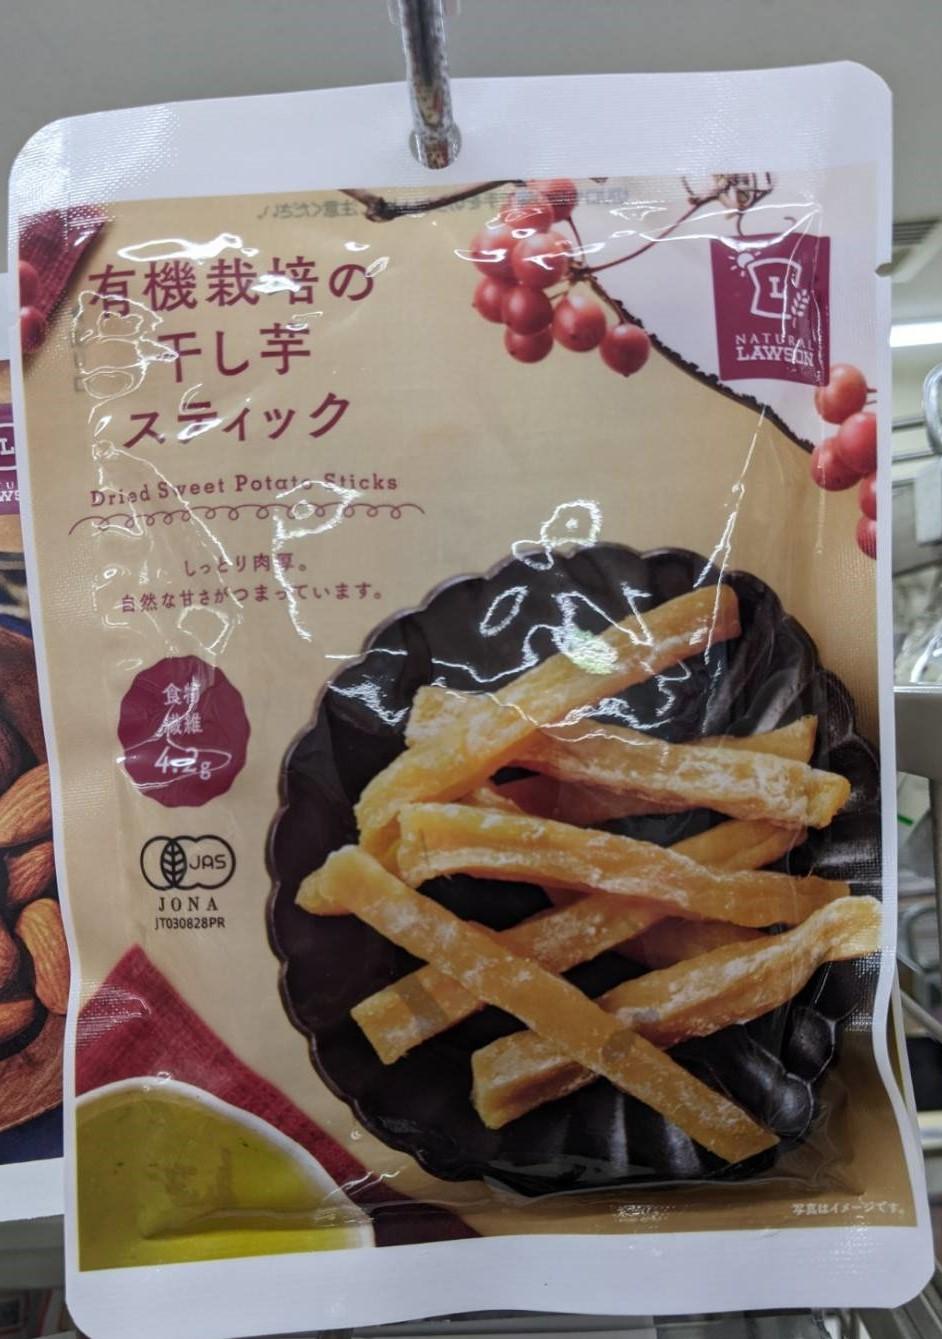 Natural Lawson and Lawson Dried Sweet Potato Sticks